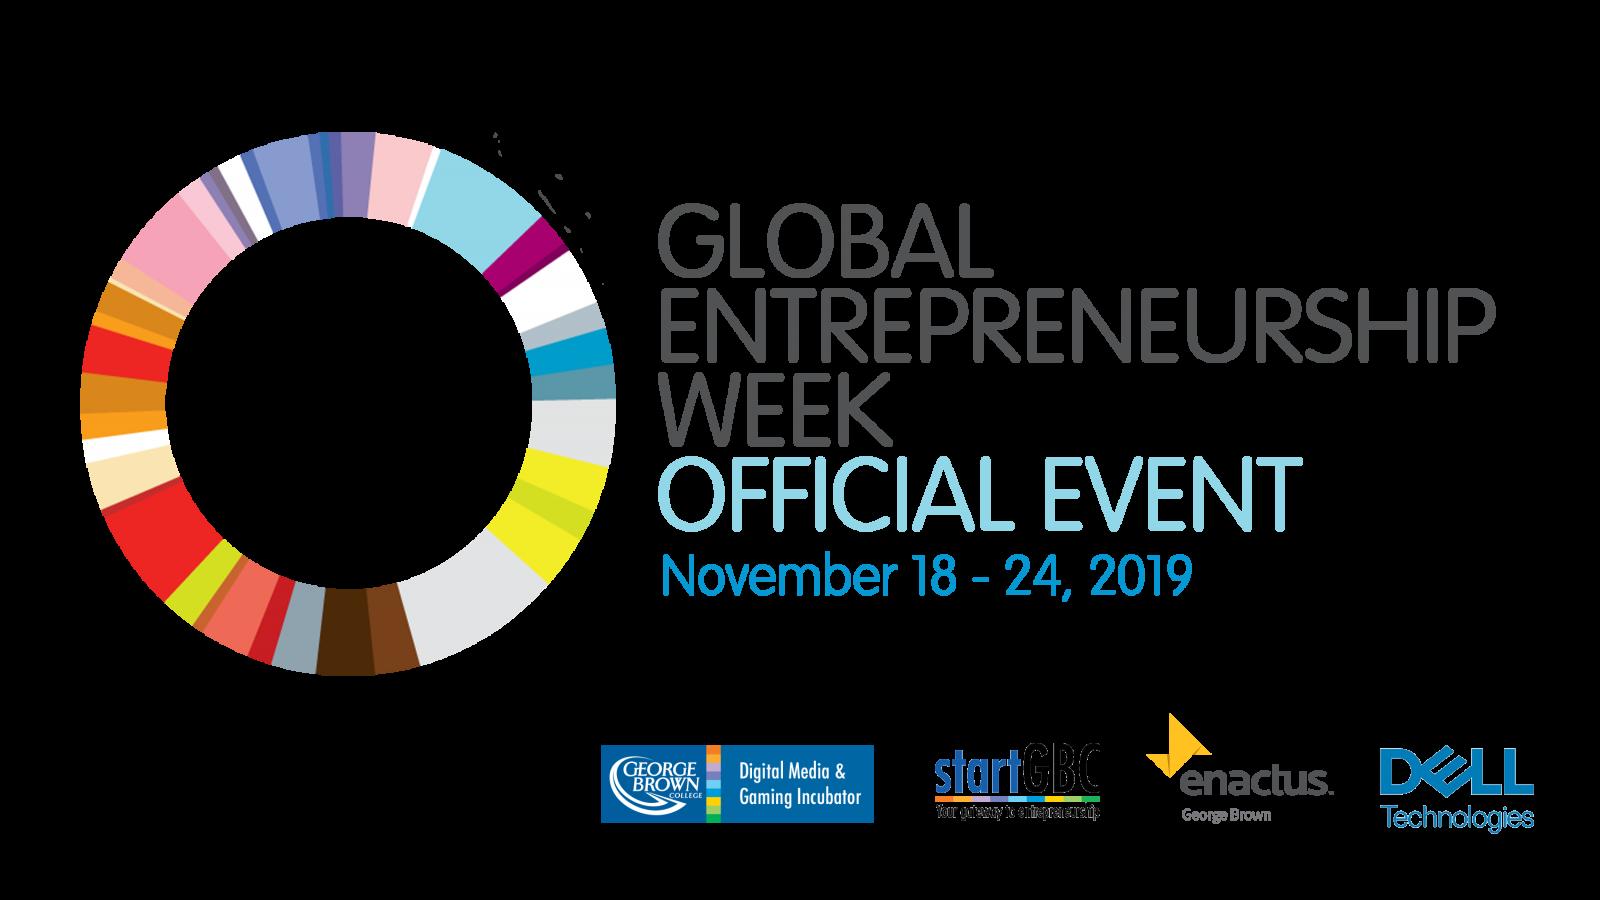 George Brown College Global Entrepreneurship Week Logo November 18 - 24, 2019